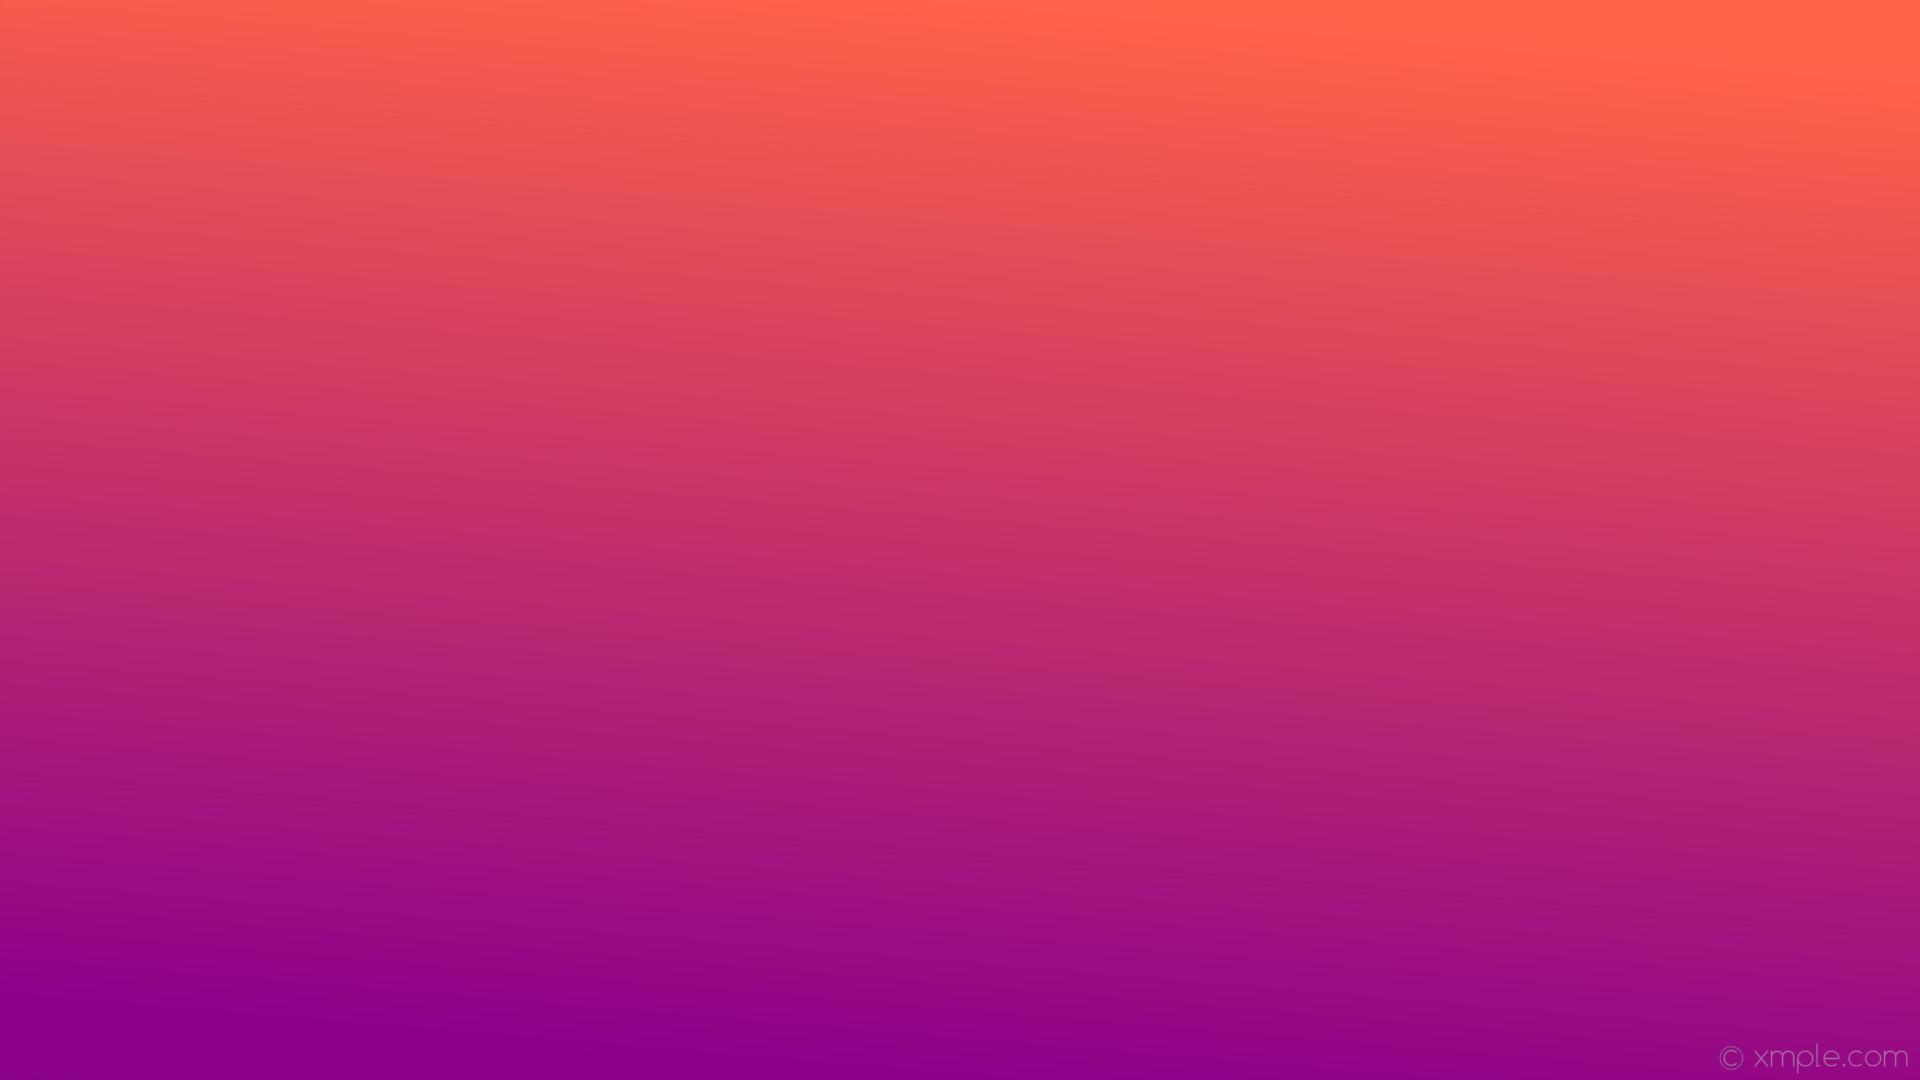 wallpaper purple orange gradient linear tomato dark magenta #ff6347 #8b008b  75°